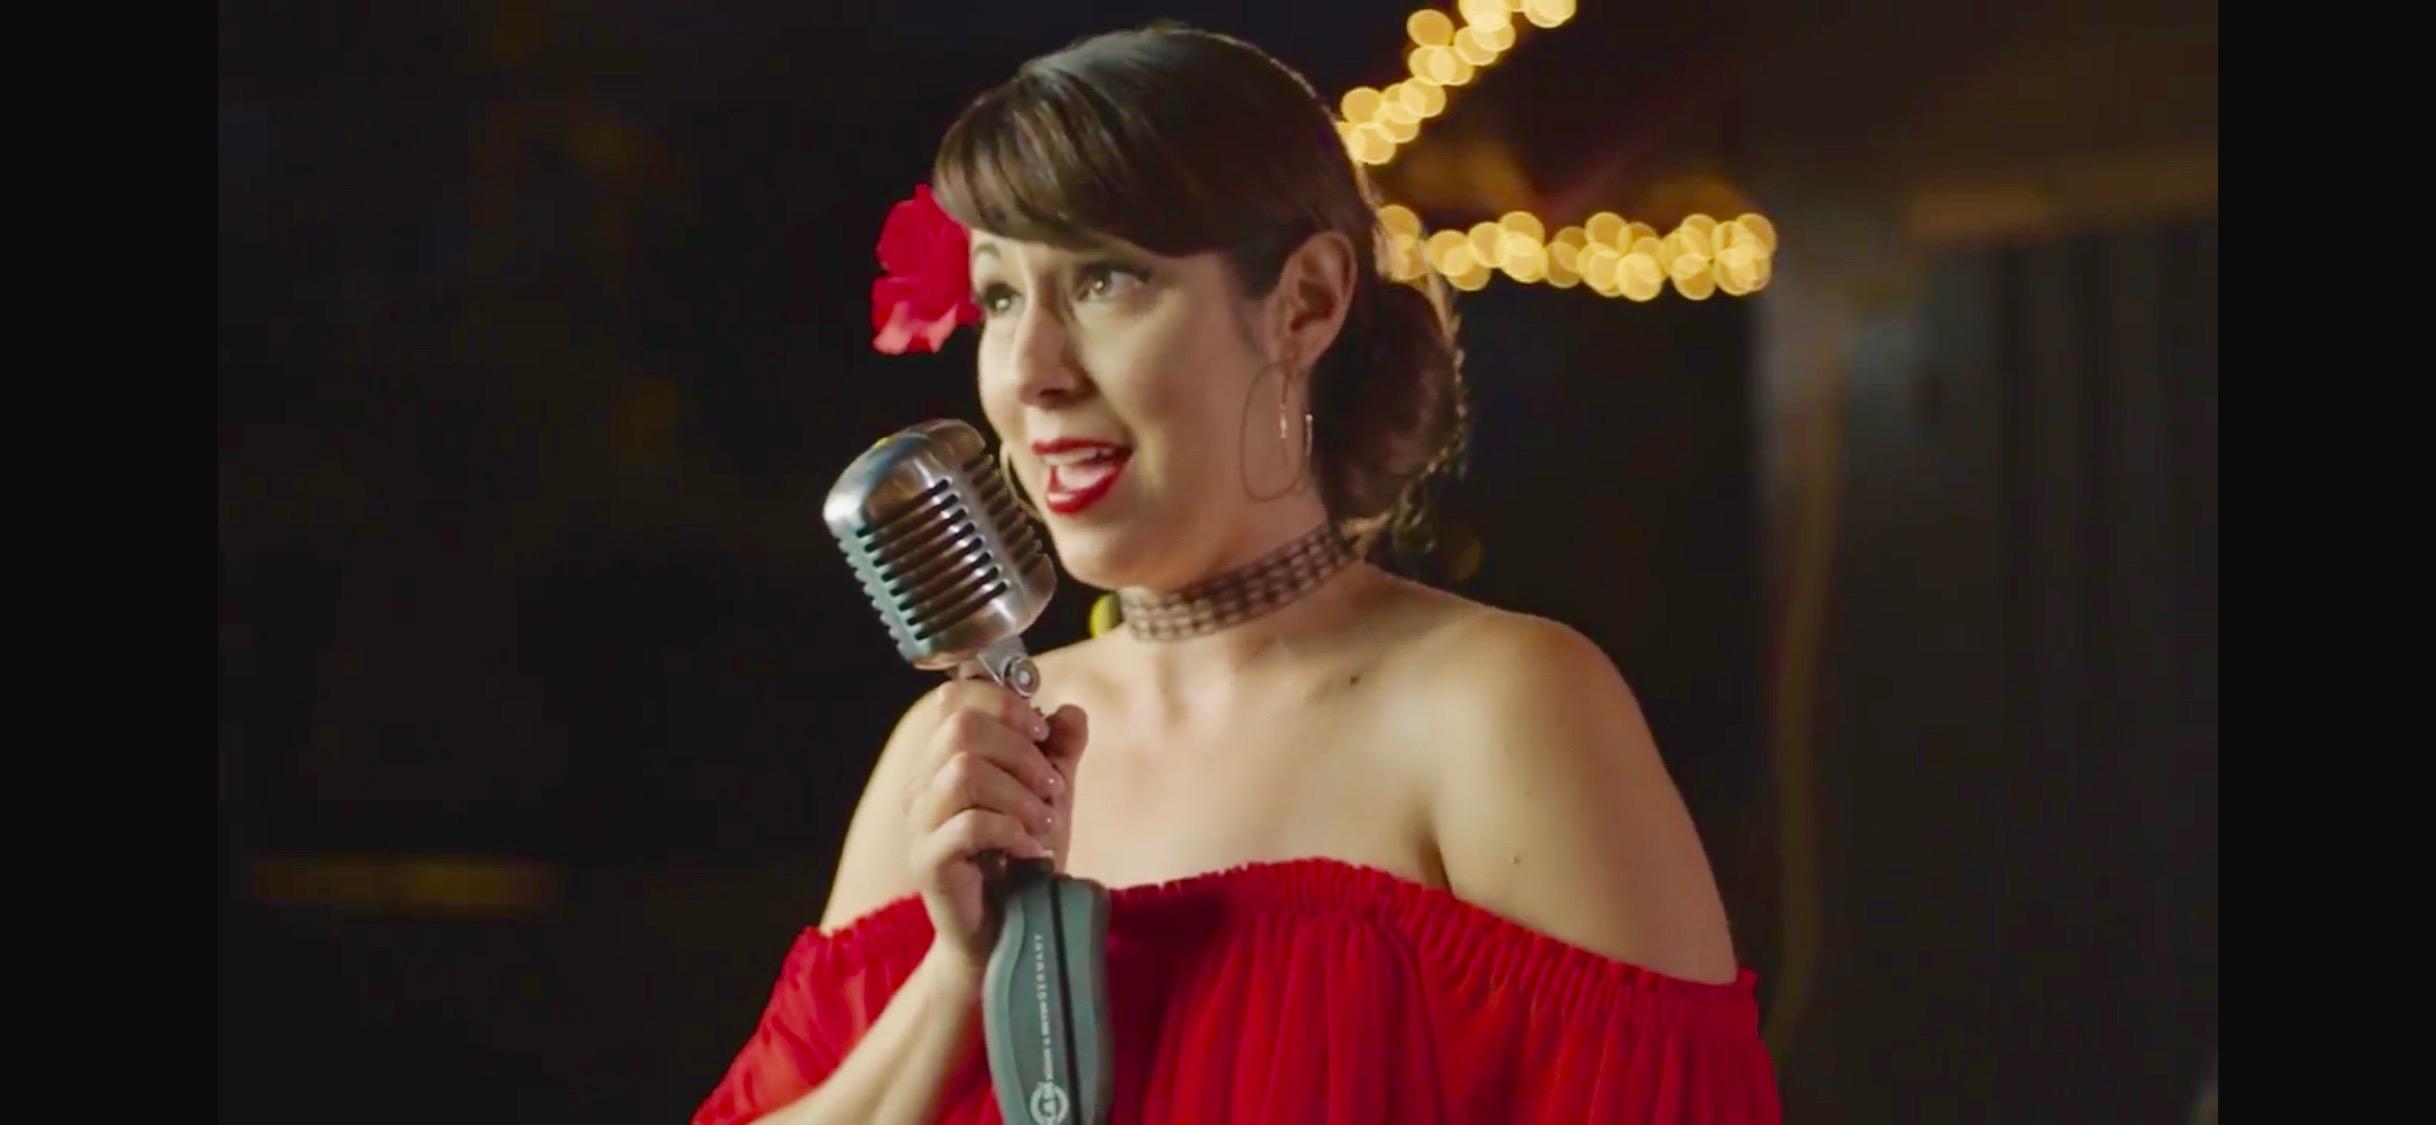 Female singer Safia Valines